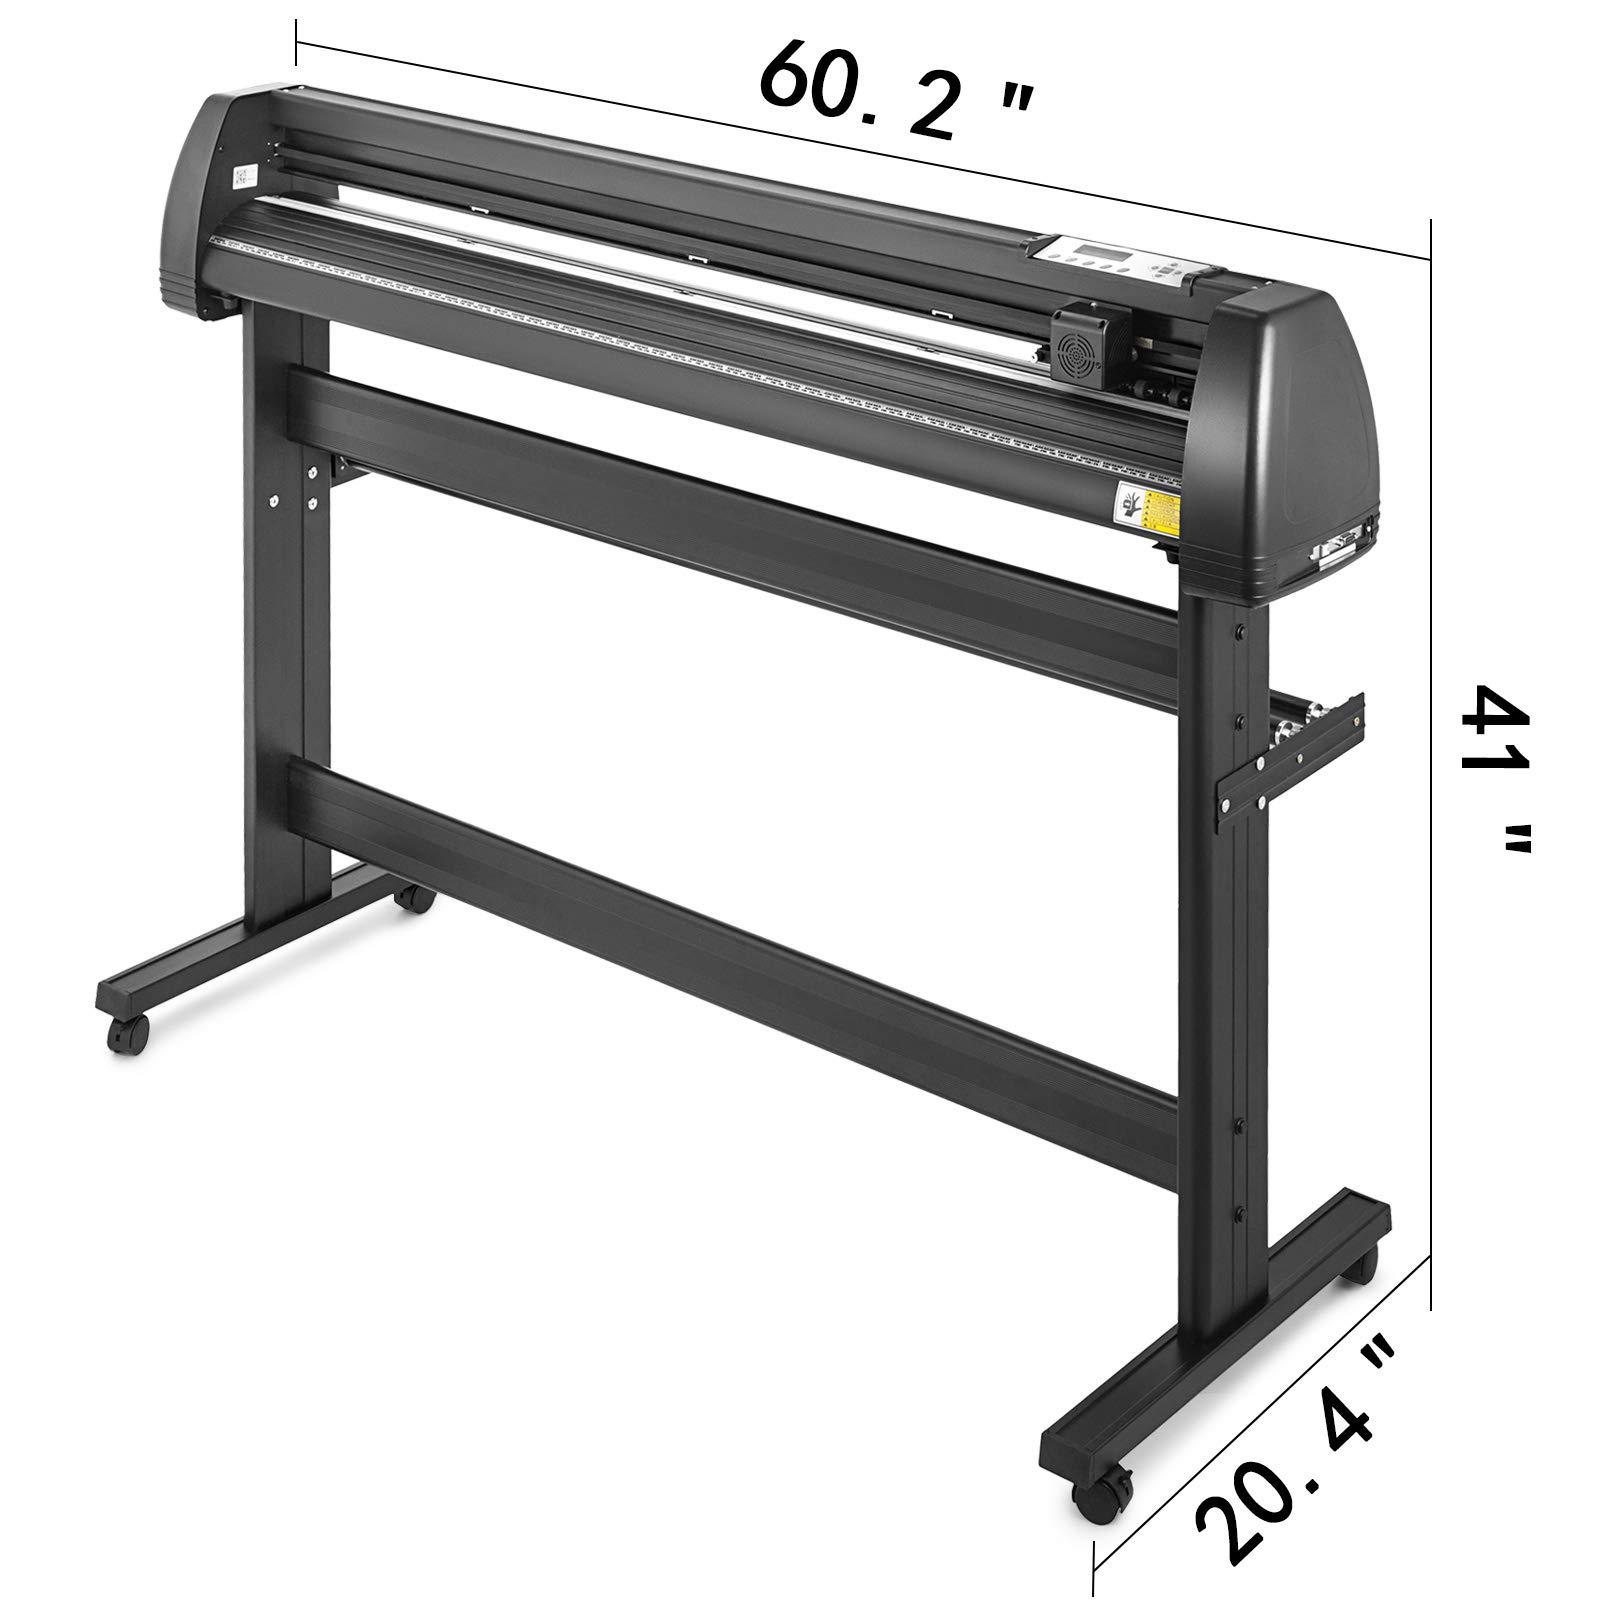 VEVOR Vinyl Cutter 53 inch Plotter Machine 1340mm Paper Feed Vinyl Cutter Plotter Signmaster Software Sign Making Machinewith Stand (53Inch Style 2) by VEVOR (Image #2)